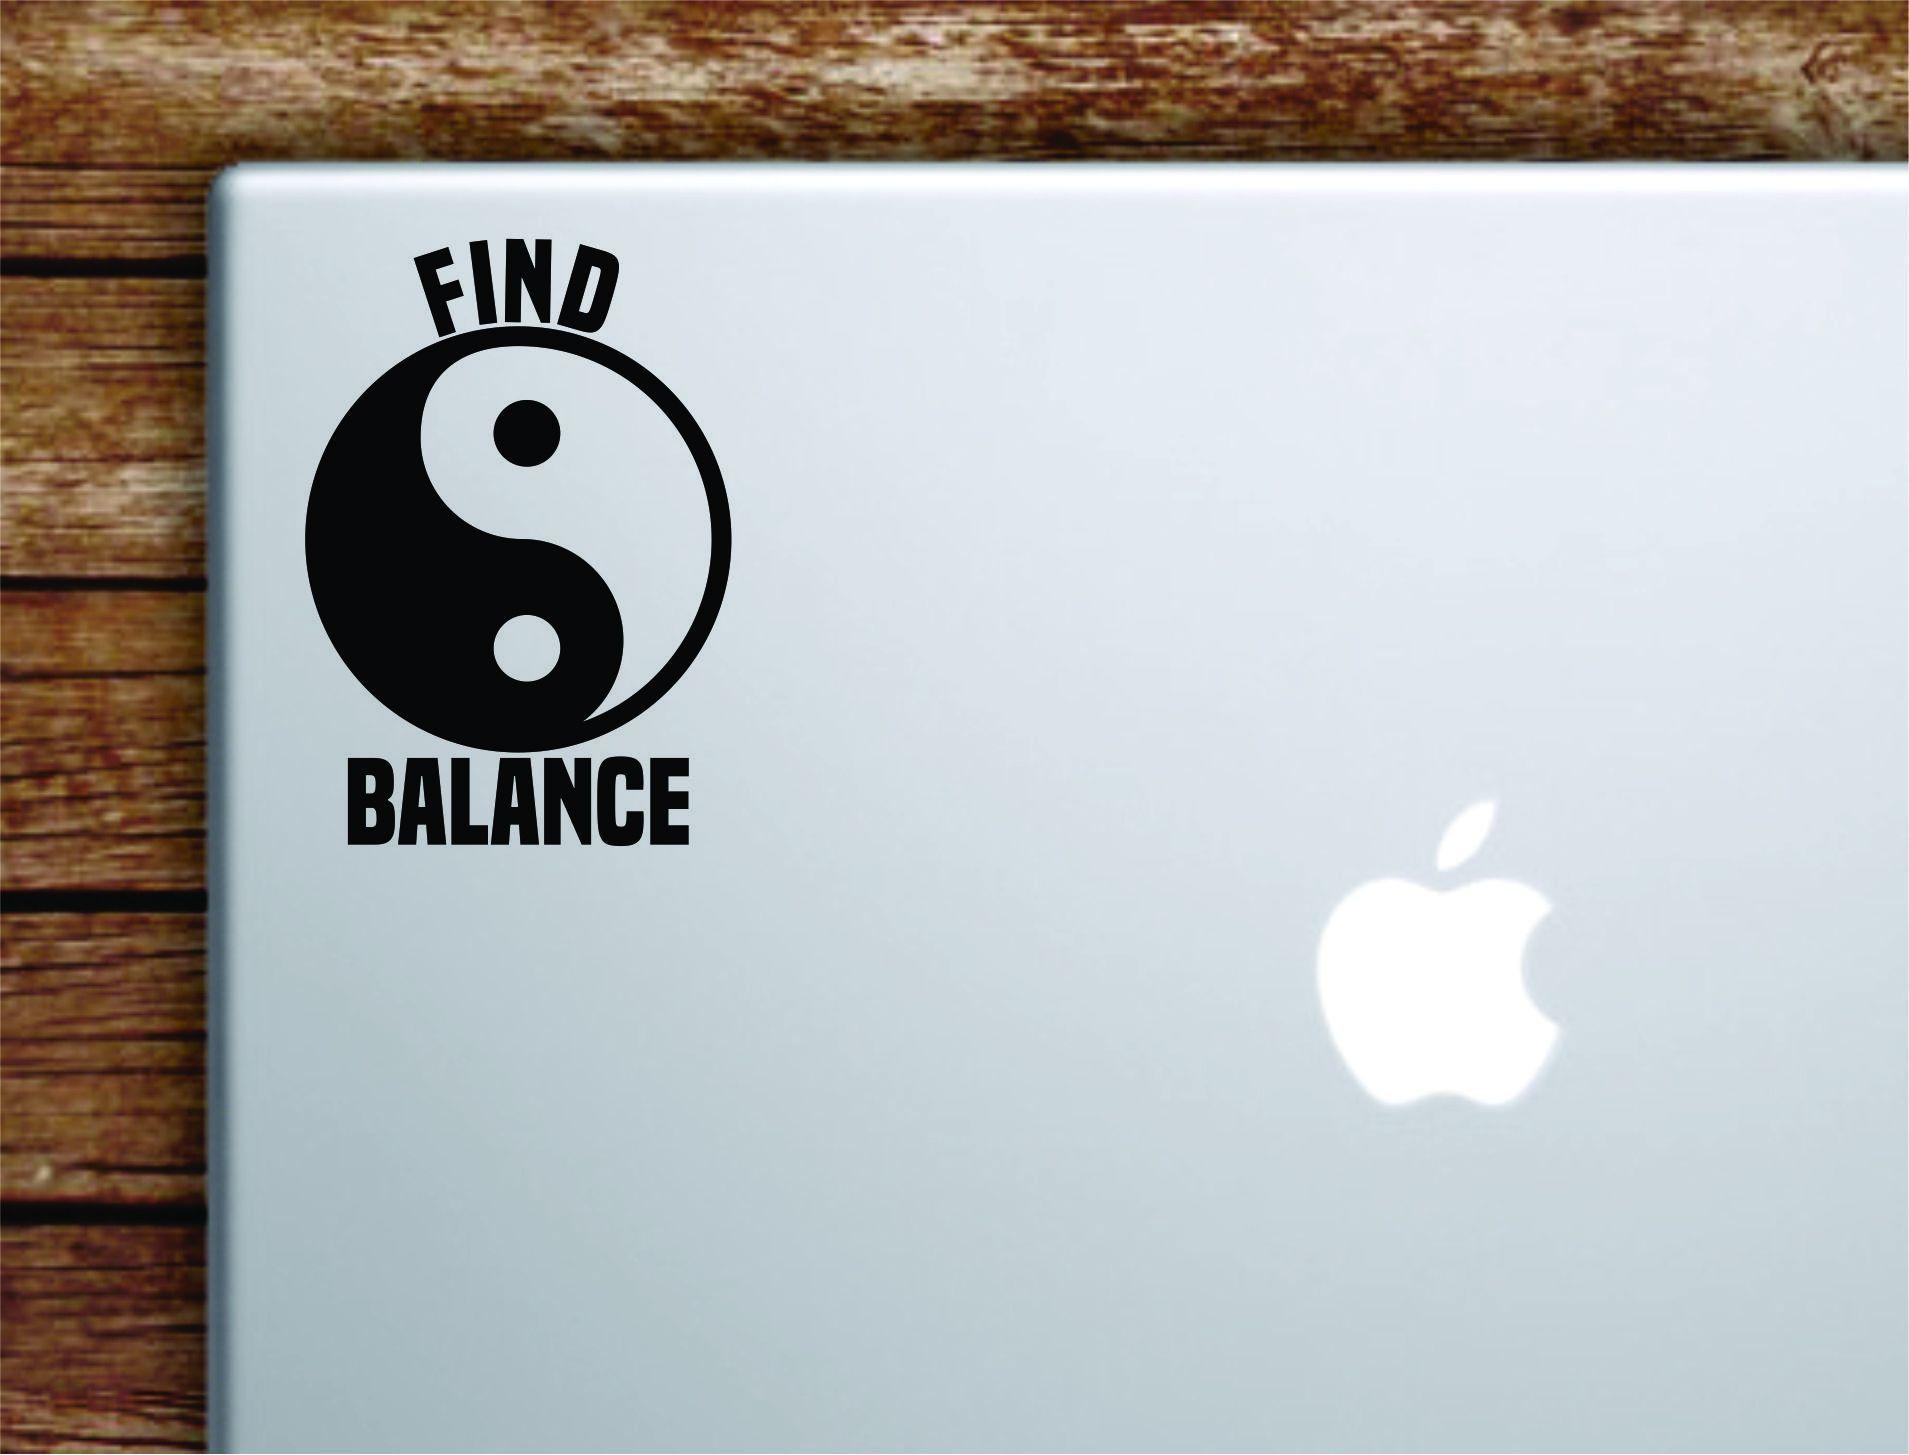 Find Balance Laptop Wall Decal Sticker Vinyl Art Quote Macbook Apple Decor Car Window Truck Kids Baby Teen Inspirational Yoga Yin Yang - saphire blue